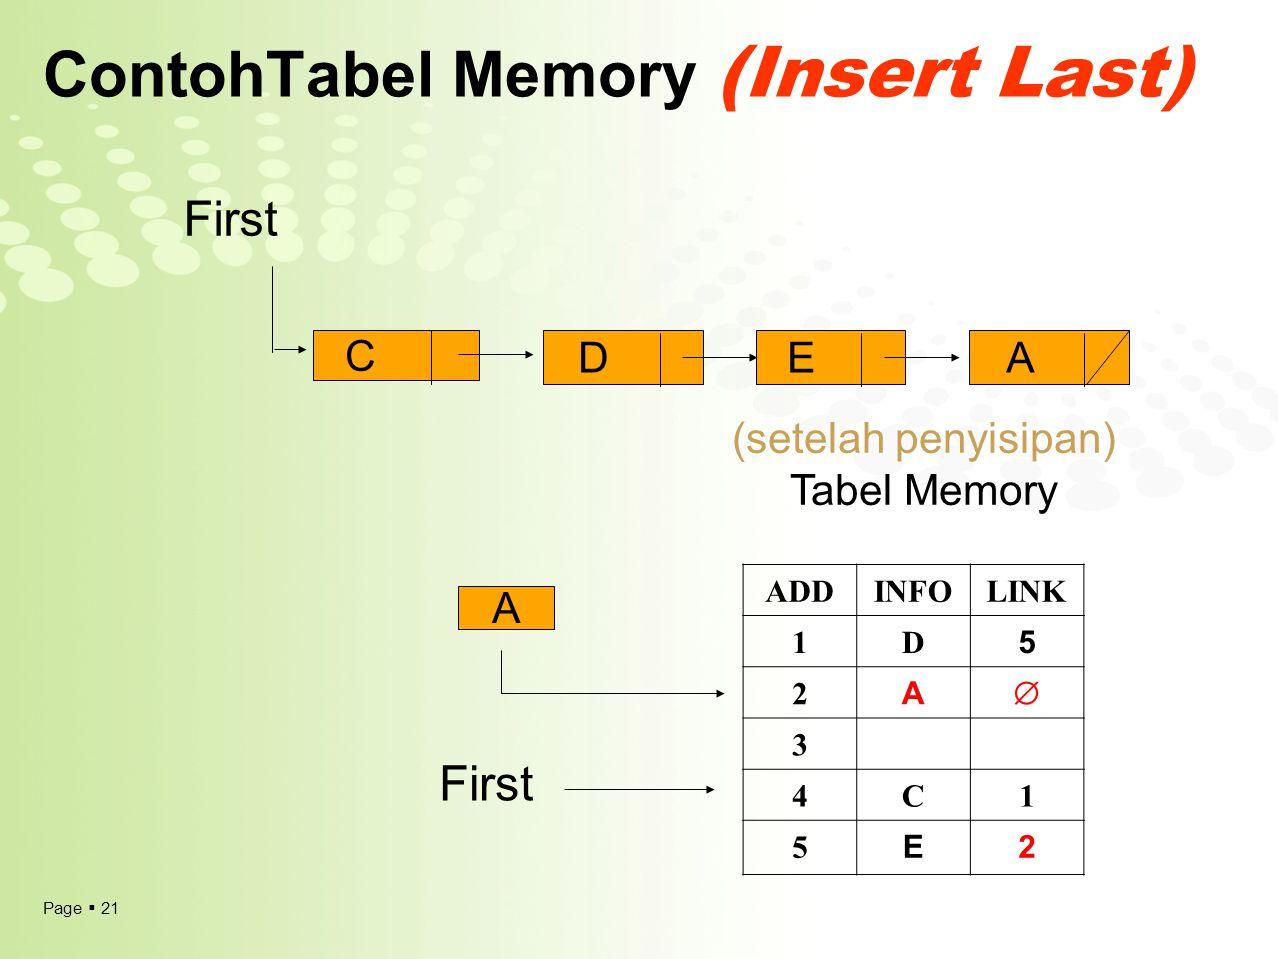 ContohTabel Memory (Insert Last)